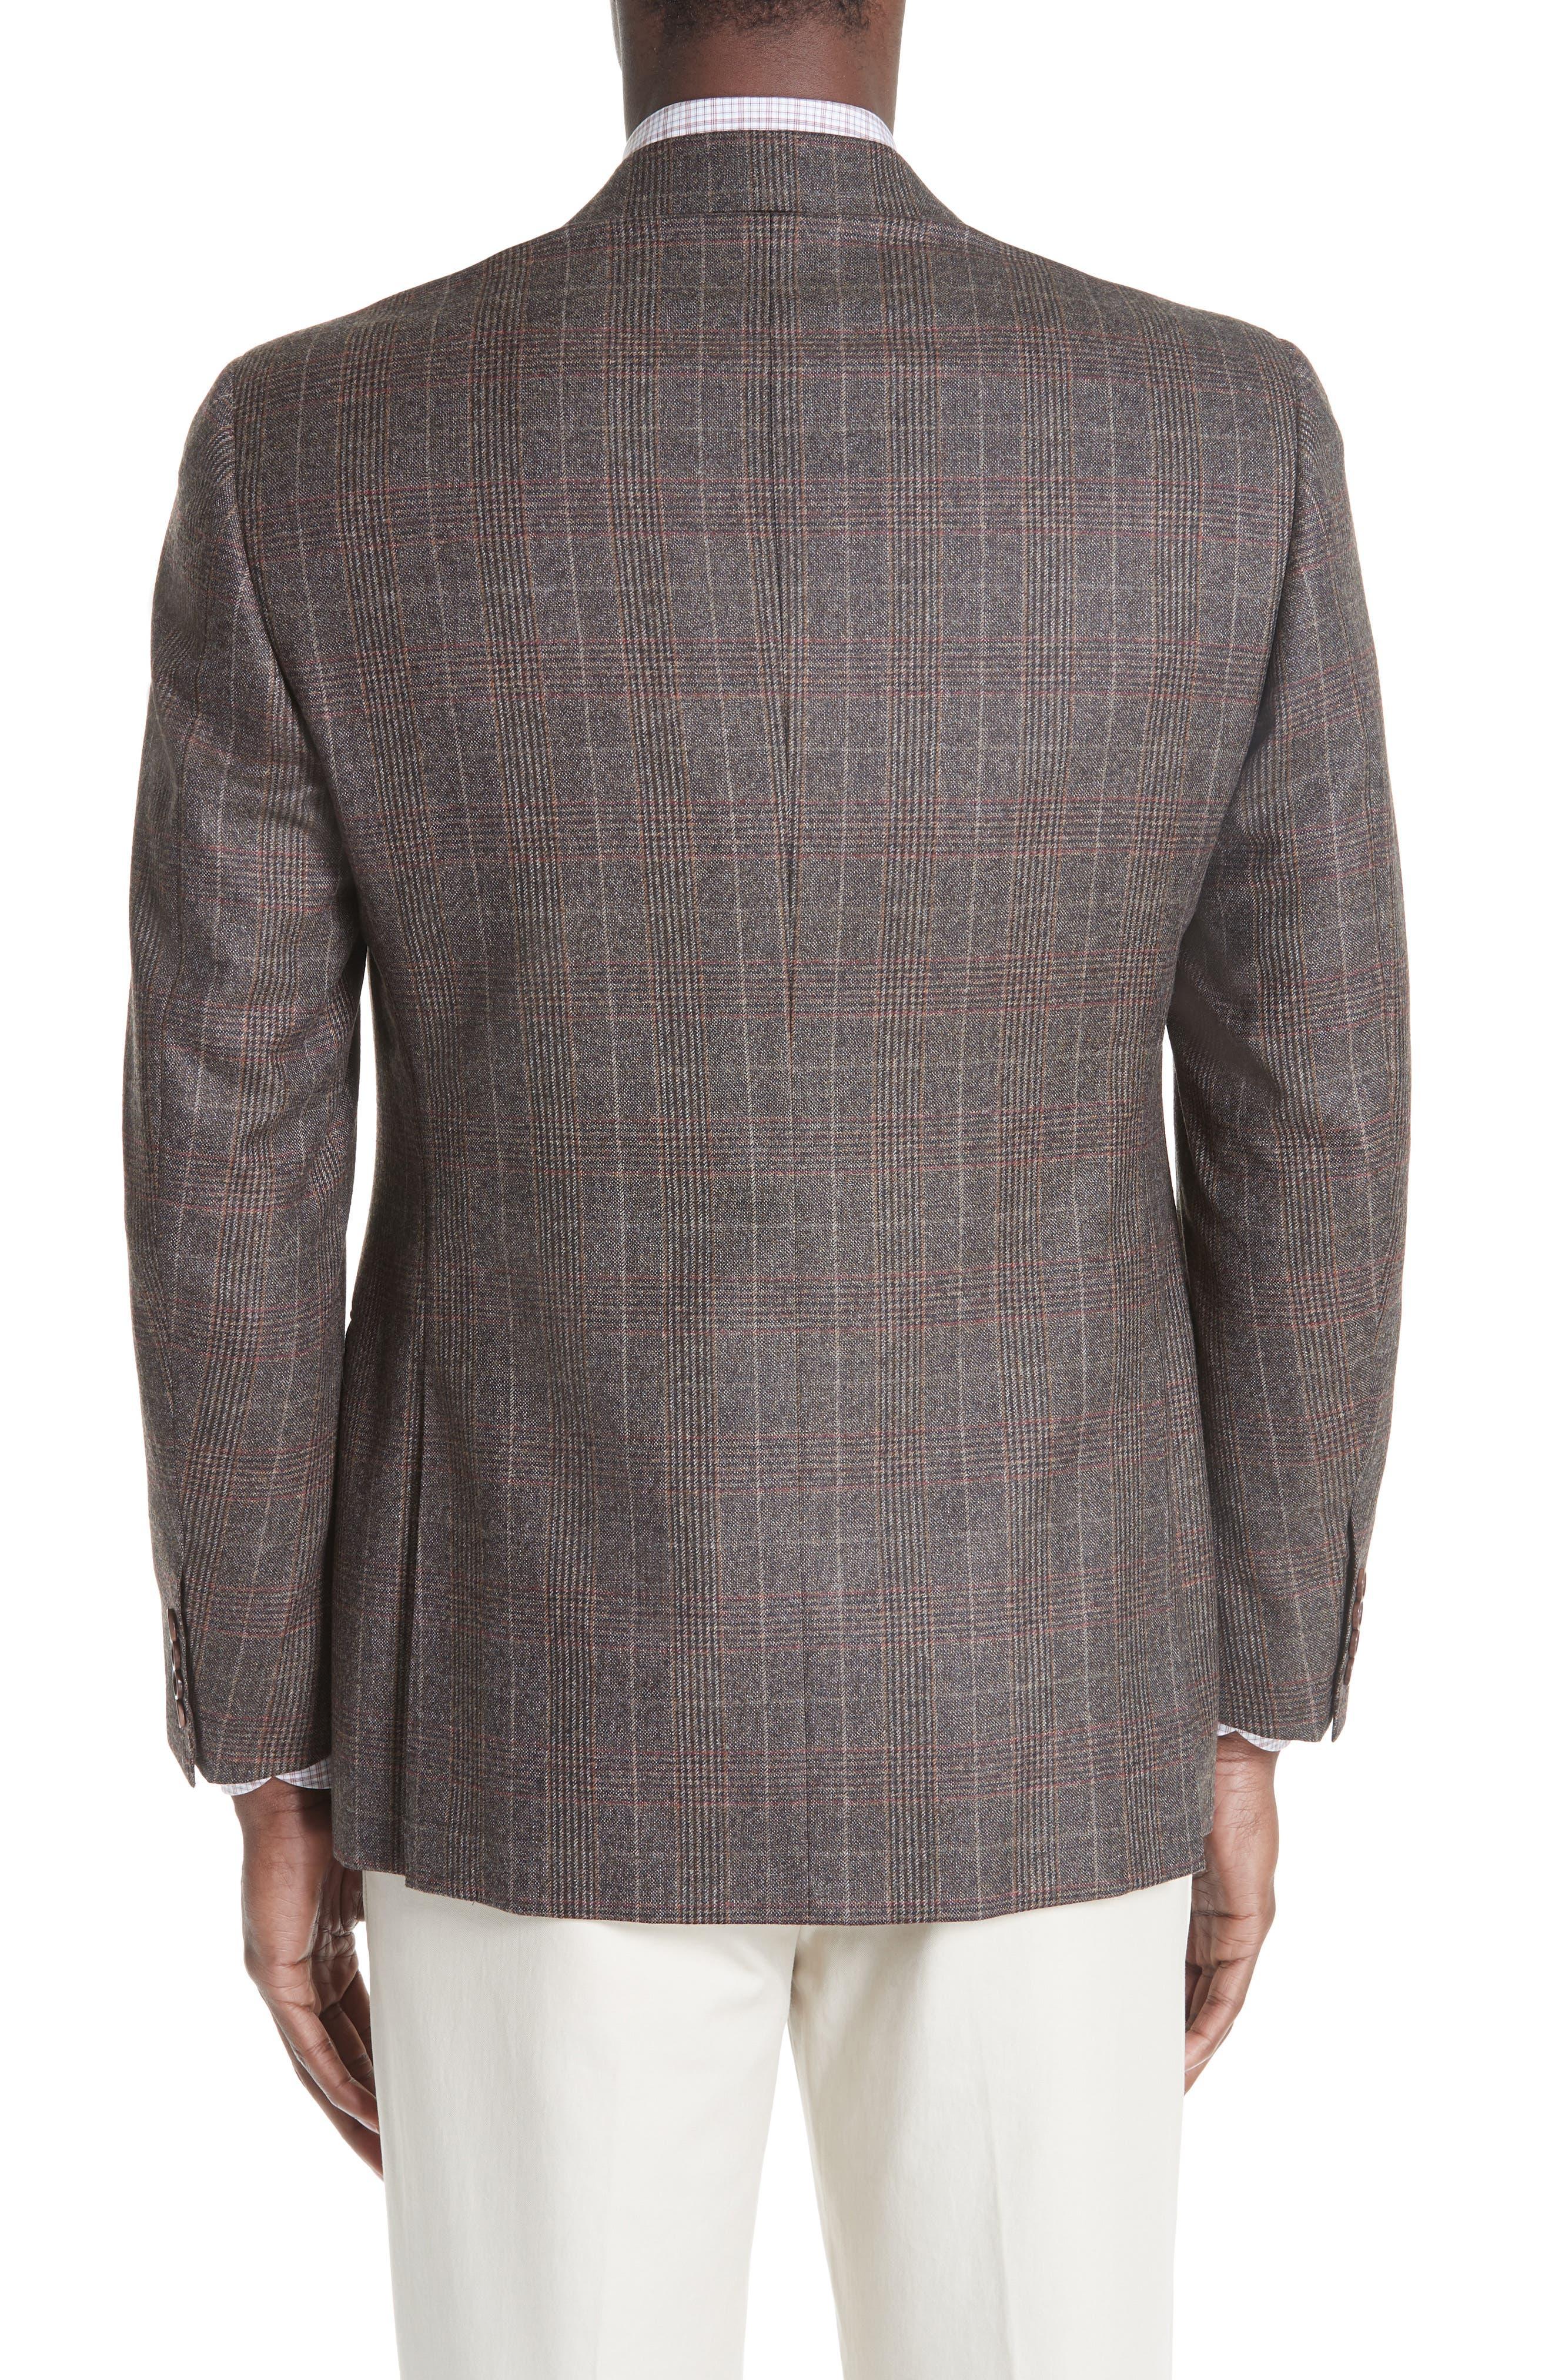 CANALI,                             Classic Fit Plaid Wool Sport Coat,                             Alternate thumbnail 2, color,                             200